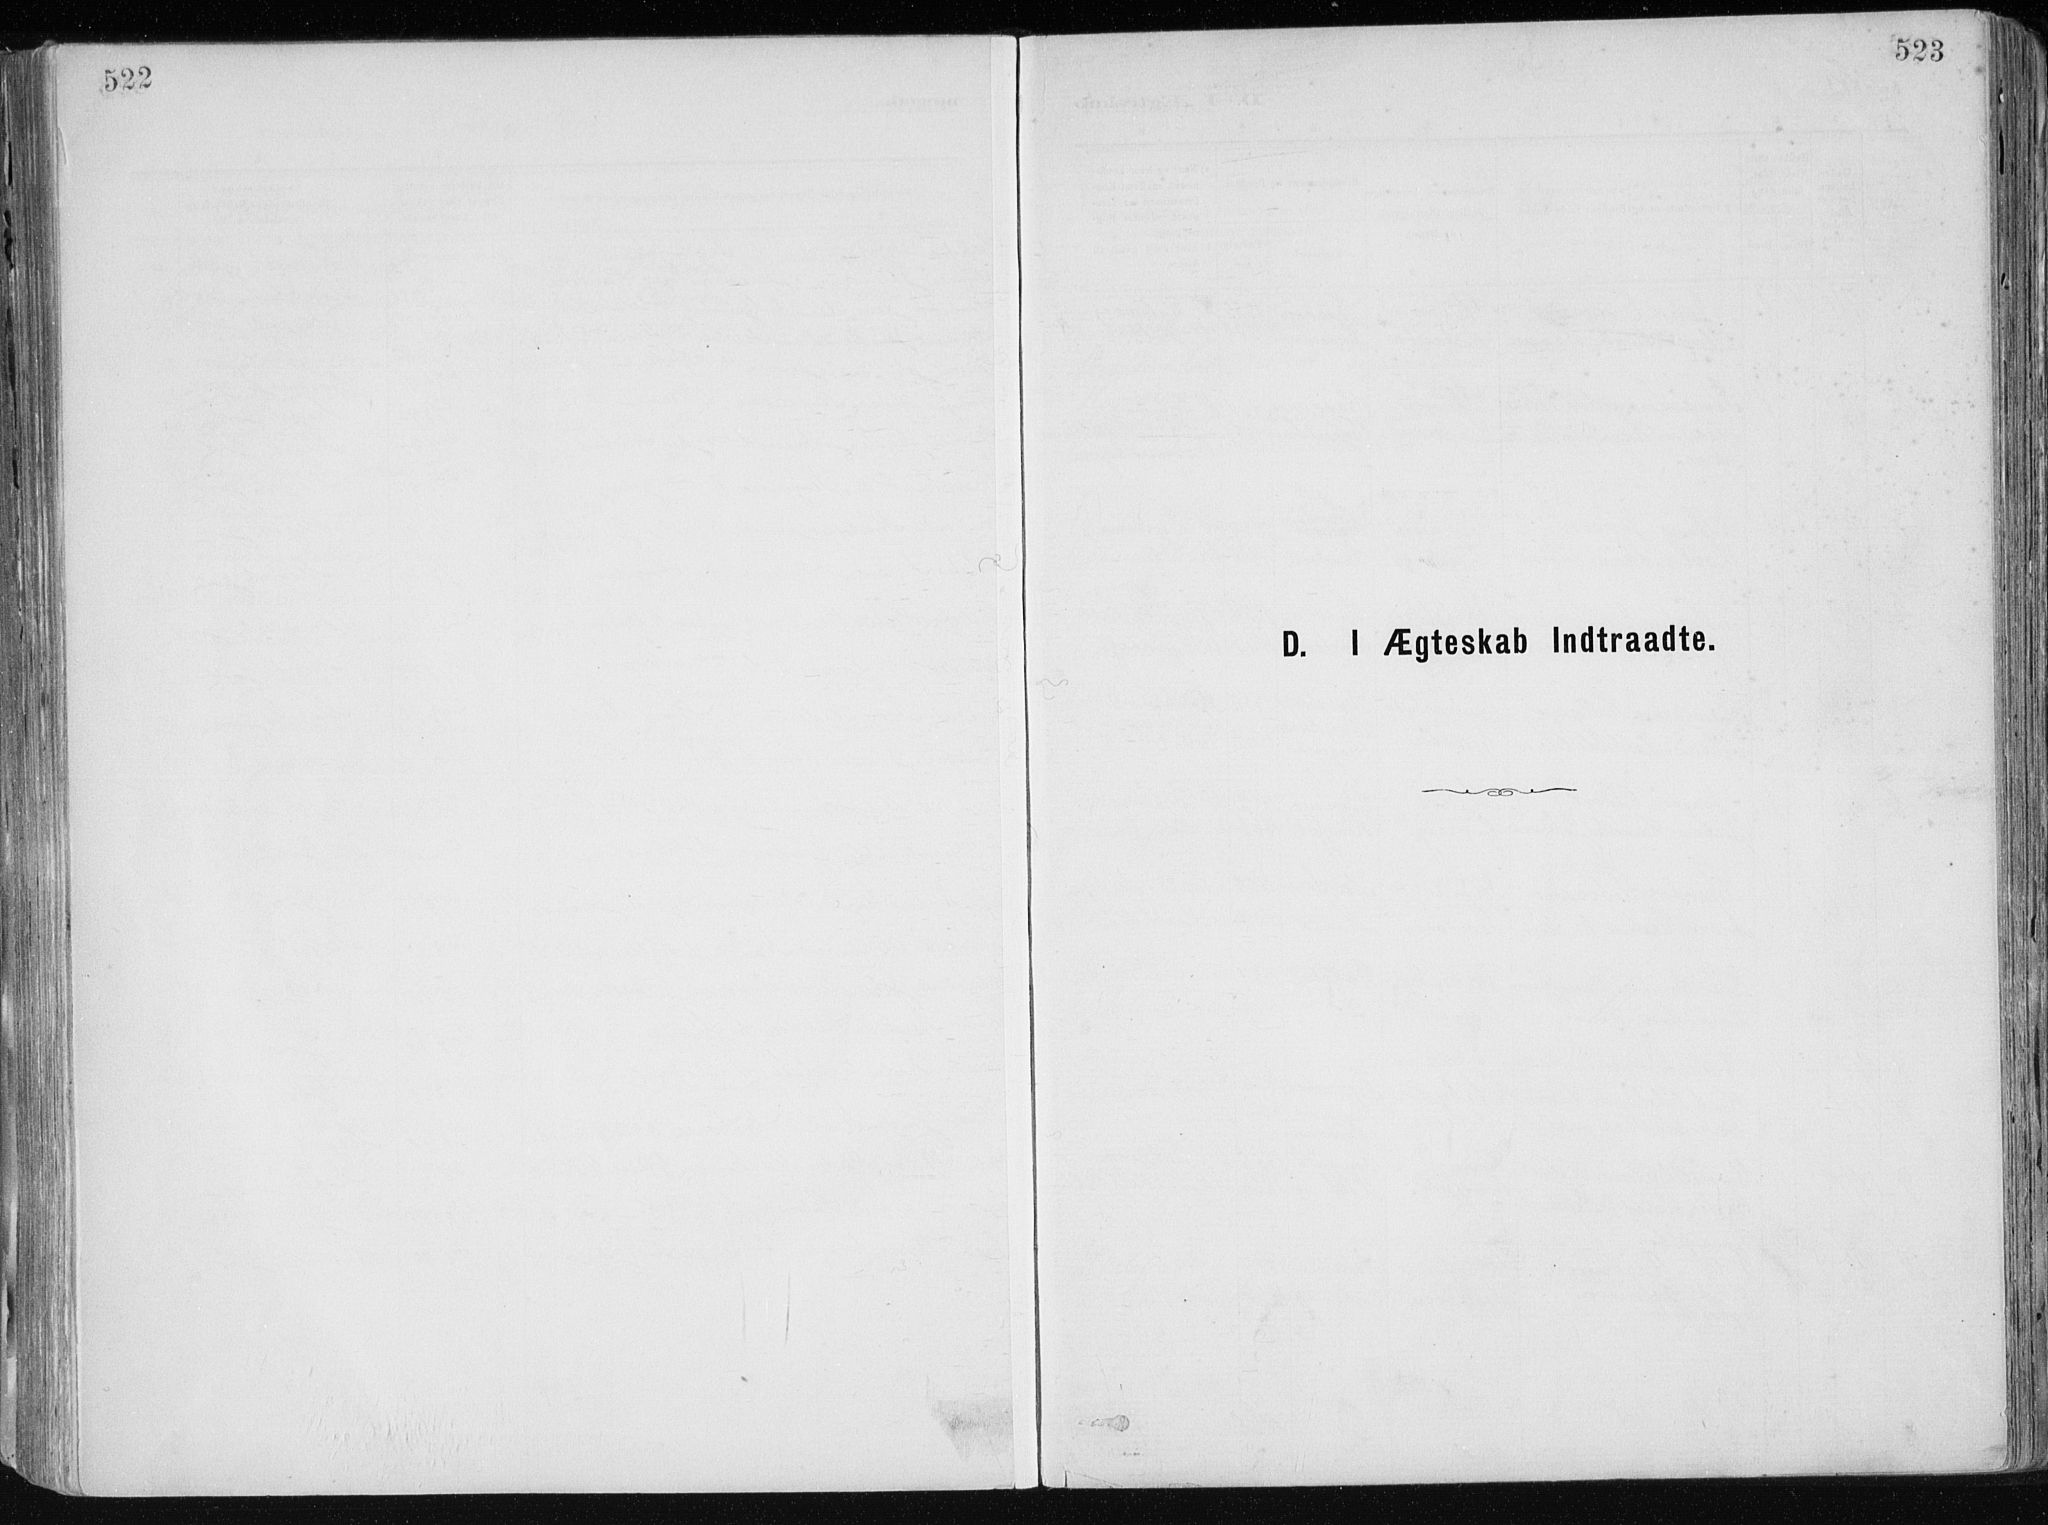 SAK, Dypvåg sokneprestkontor, F/Fa/Faa/L0008: Ministerialbok nr. A 8, 1885-1906, s. 522-523